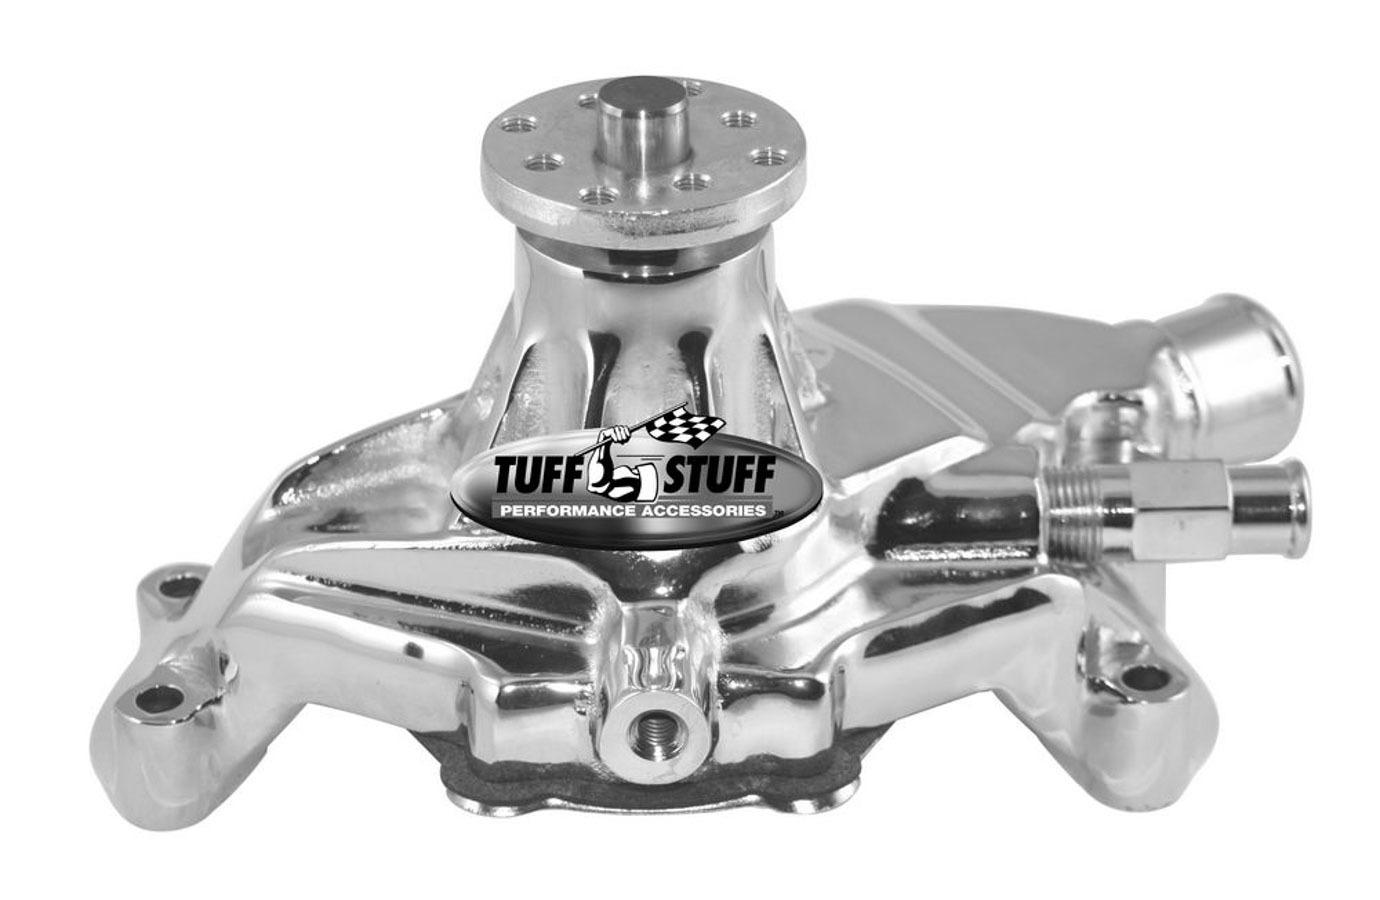 Tuff-Stuff 1635ND Water Pump, Mechanical, 3/4 in Pilot, Short Design, Aluminum, Polished, Small Block Chevy, Chevy Corvette 1984-91, Each